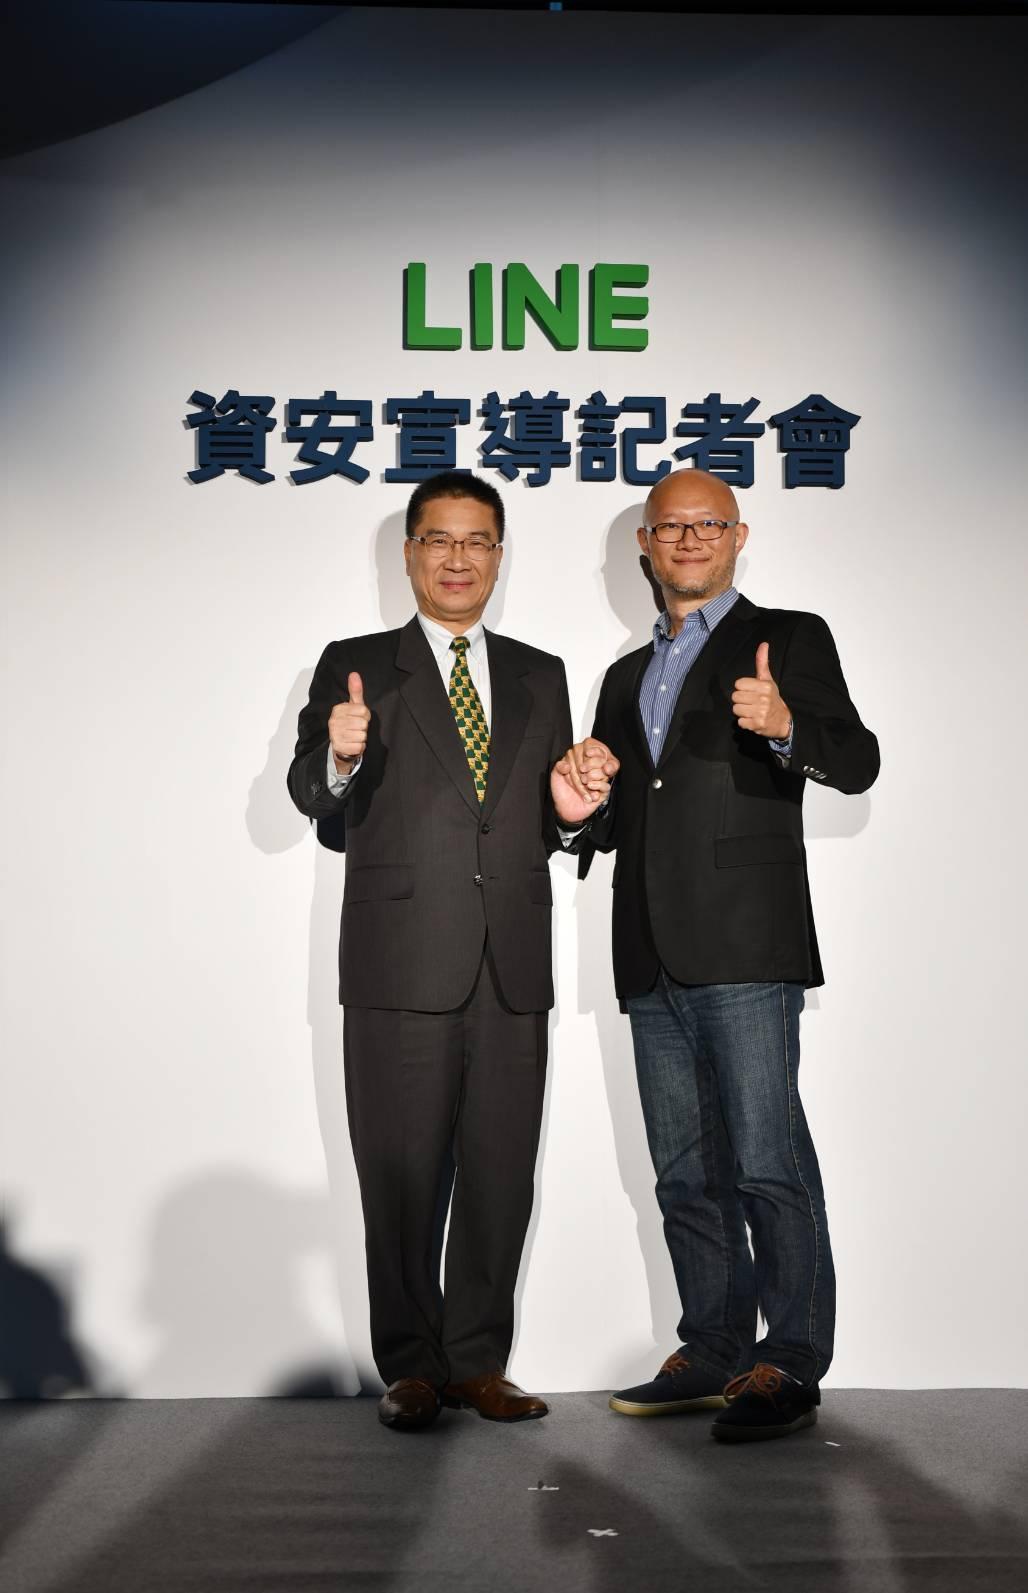 LINE攜手內政部共同推動 2018年LINE資安宣導活動